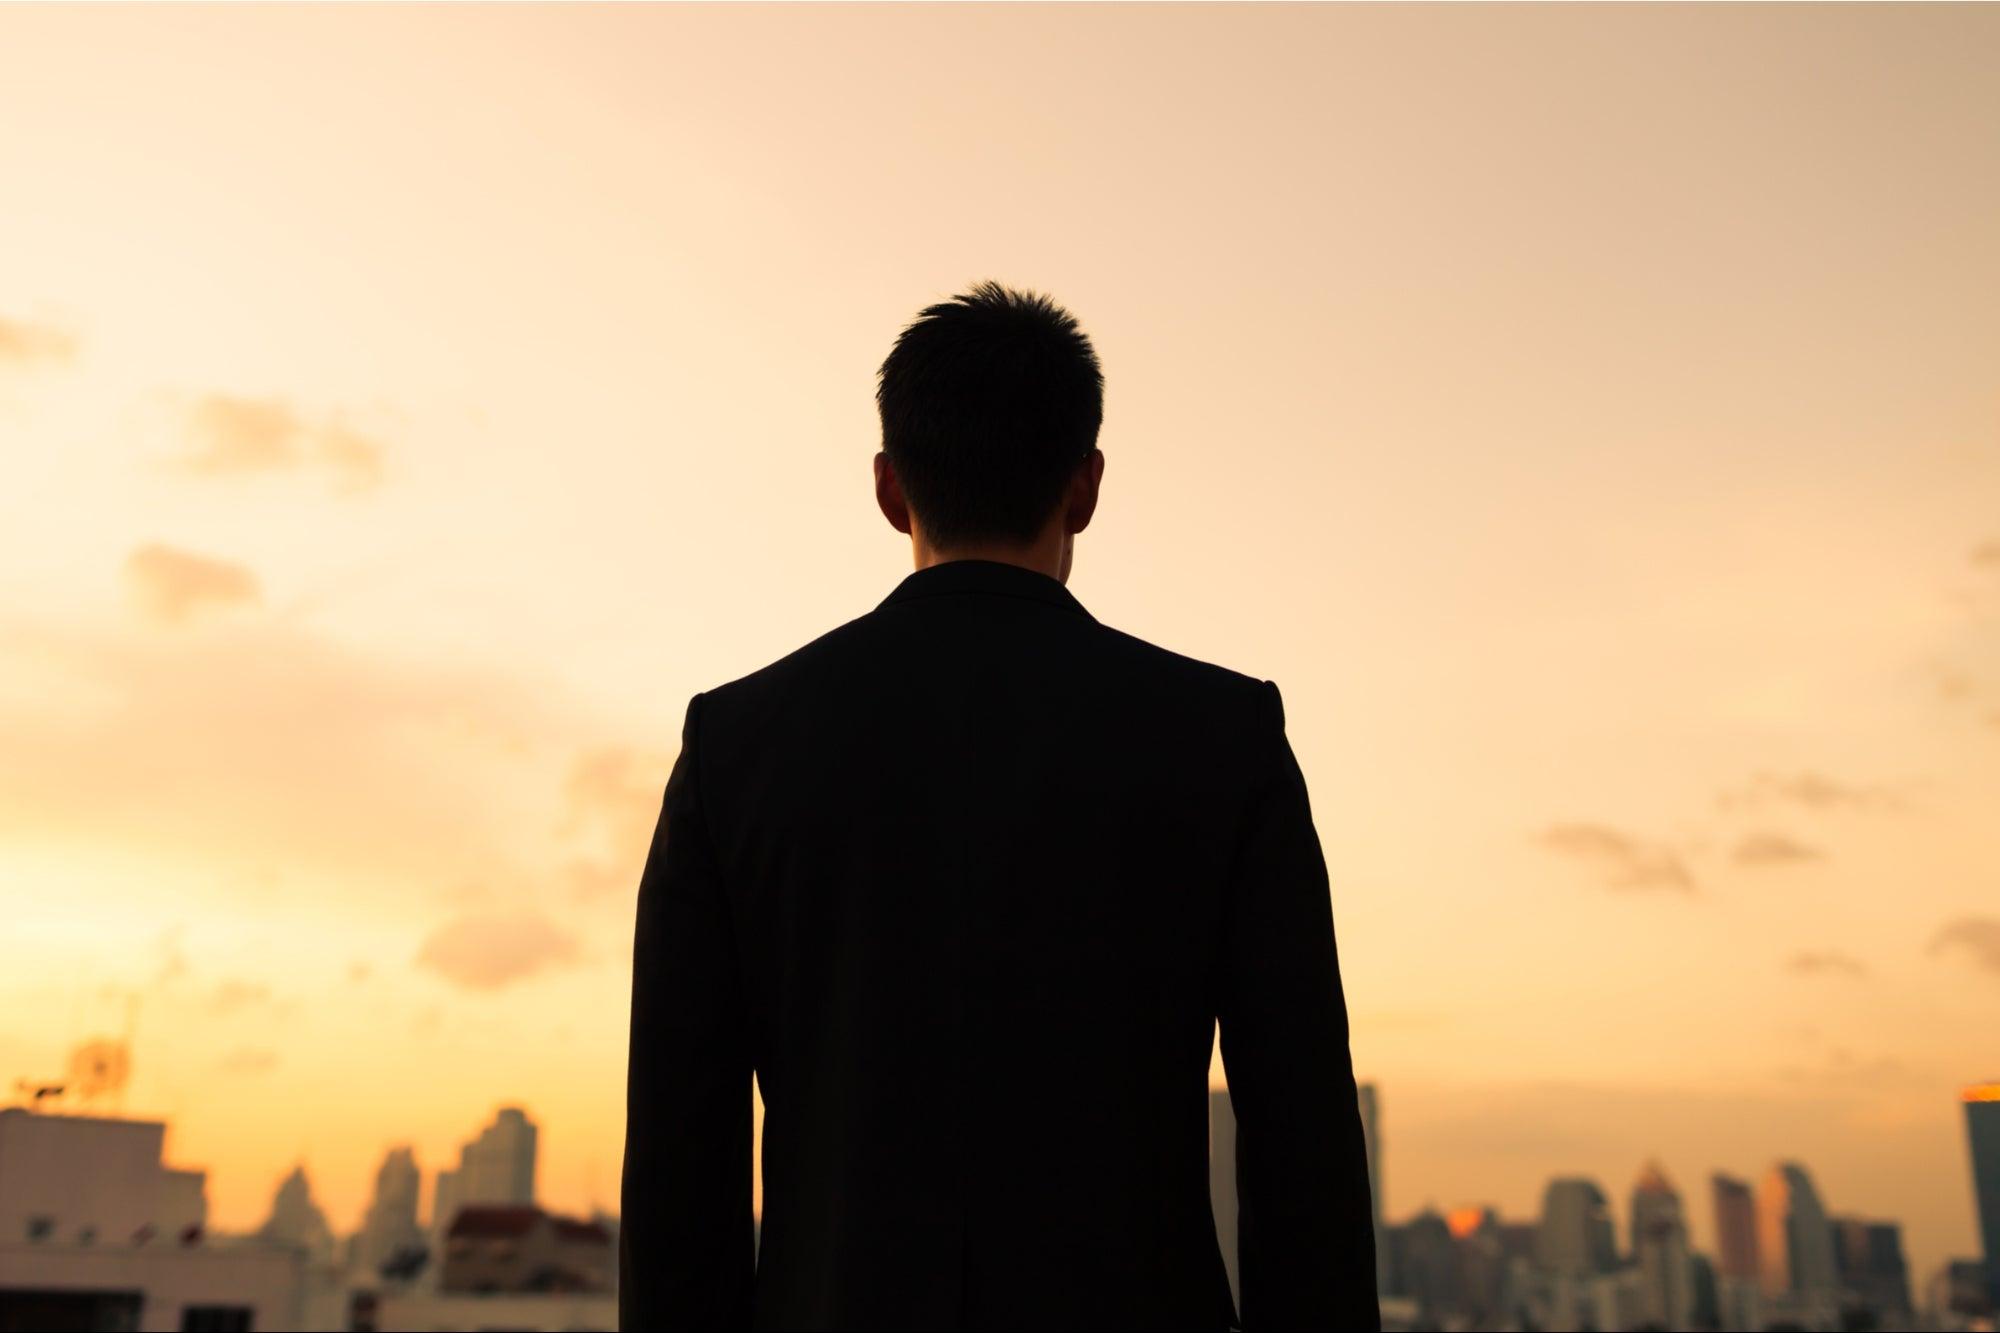 Environmental Factors Preventing Aspiring Entrepreneurs From Becoming One